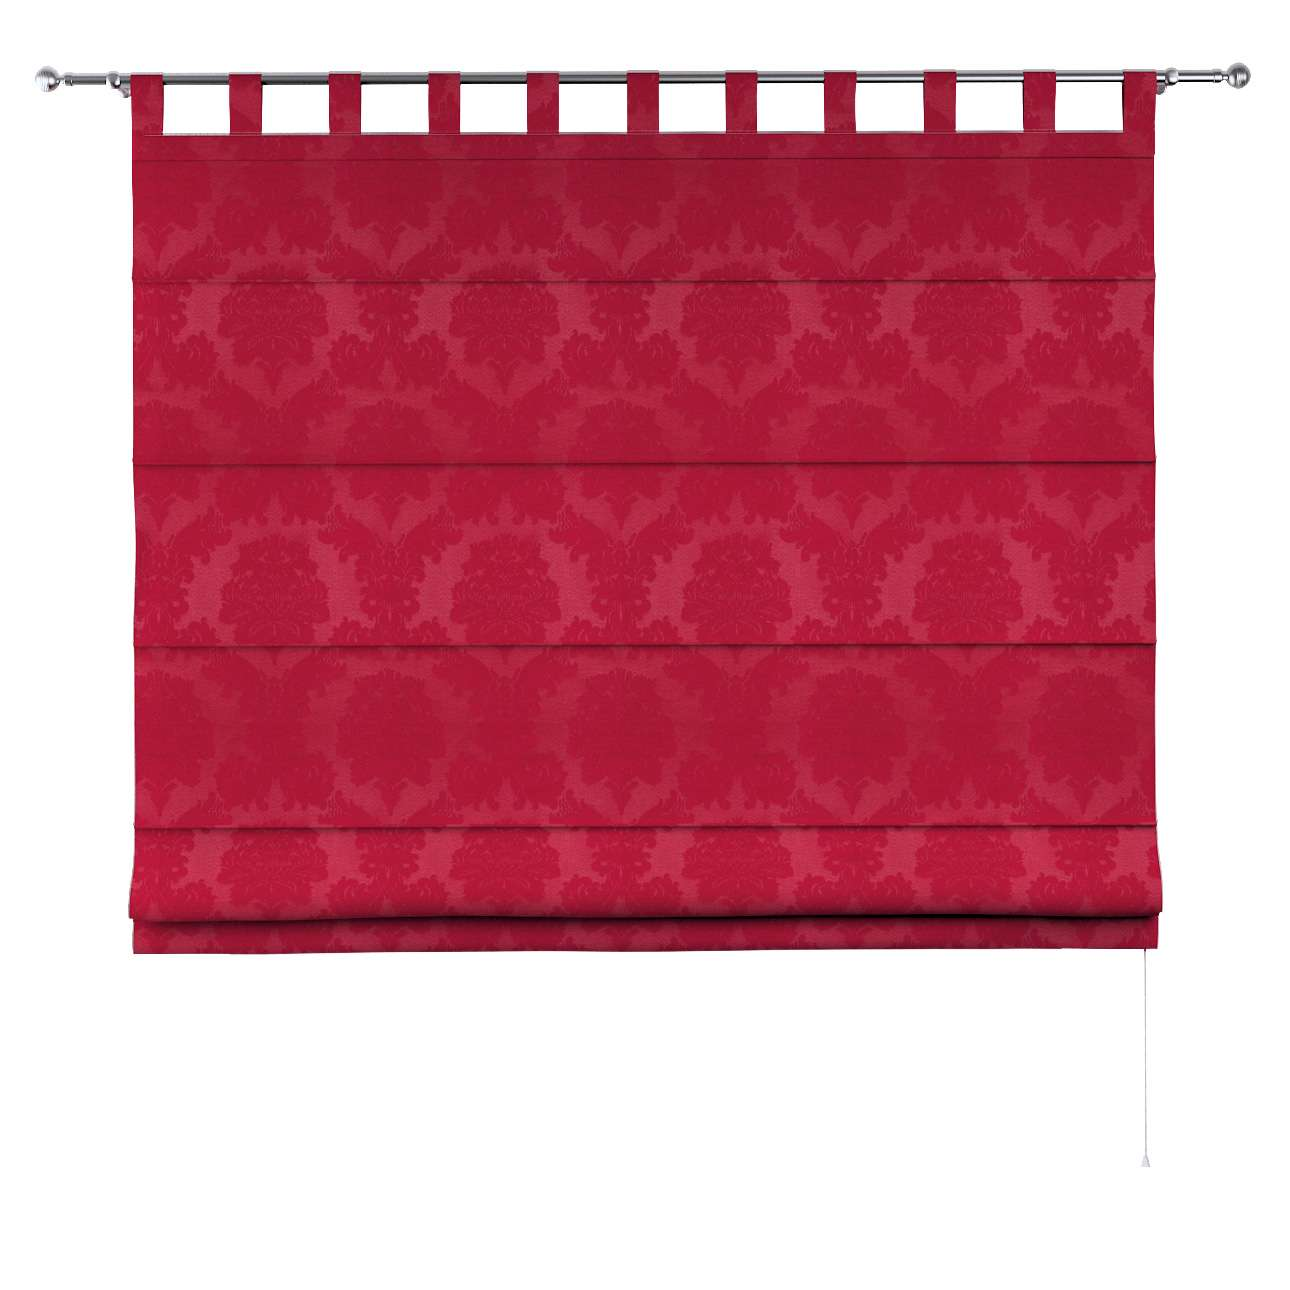 Foldegardin Verona<br/>Med stropper til gardinstang fra kollektionen Damasco, Stof: 613-13